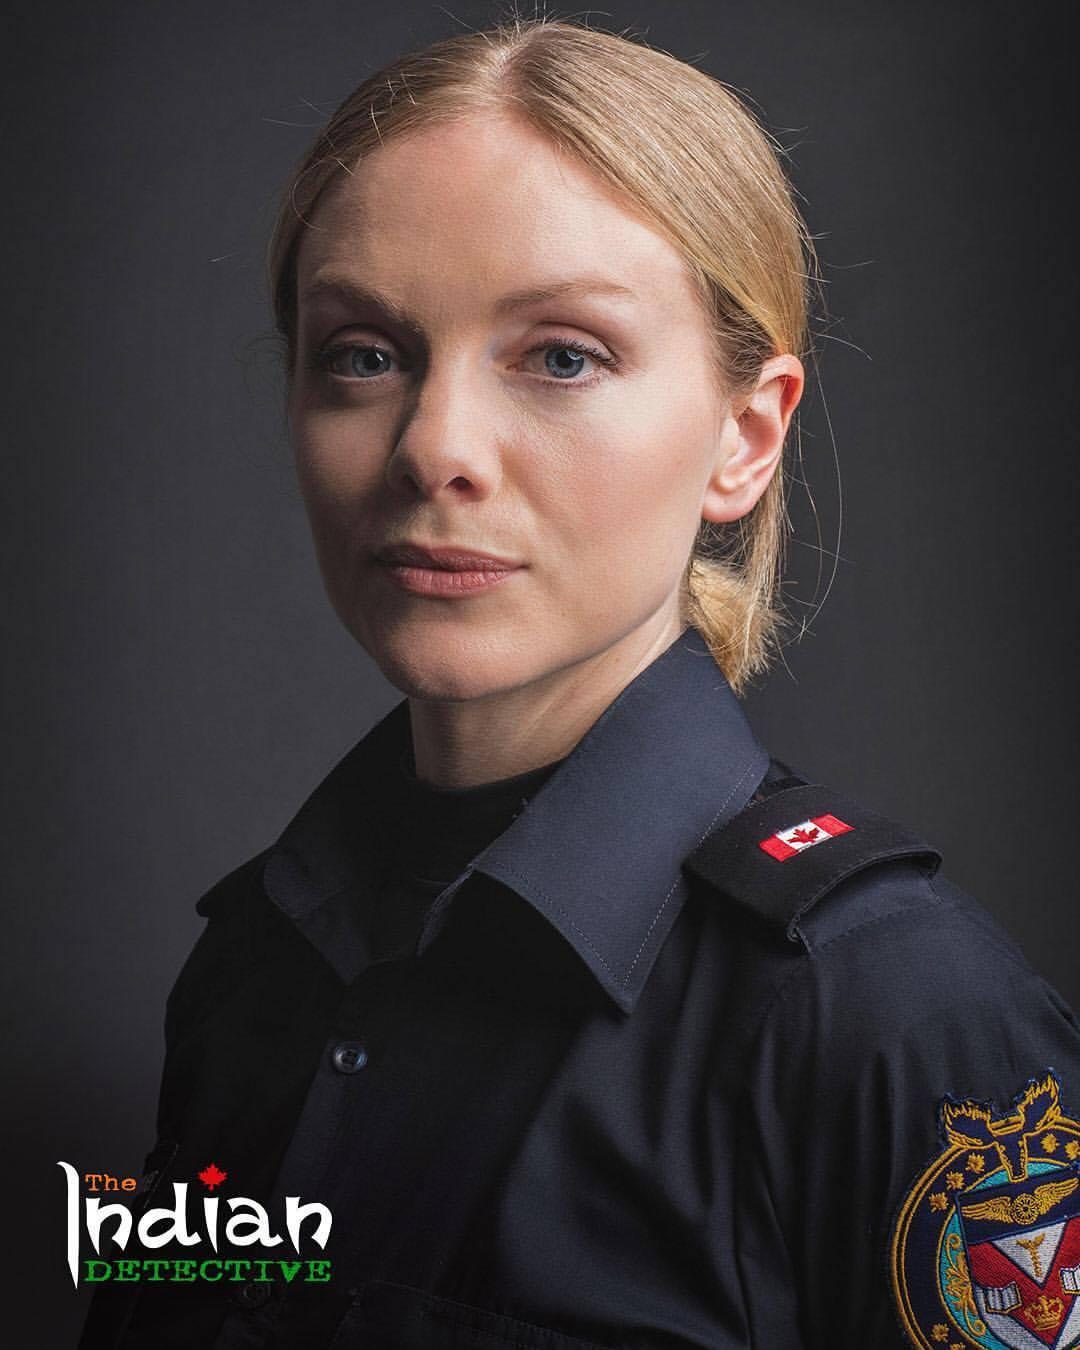 Christina Cole در صحنه سریال تلویزیونی The Indian Detective